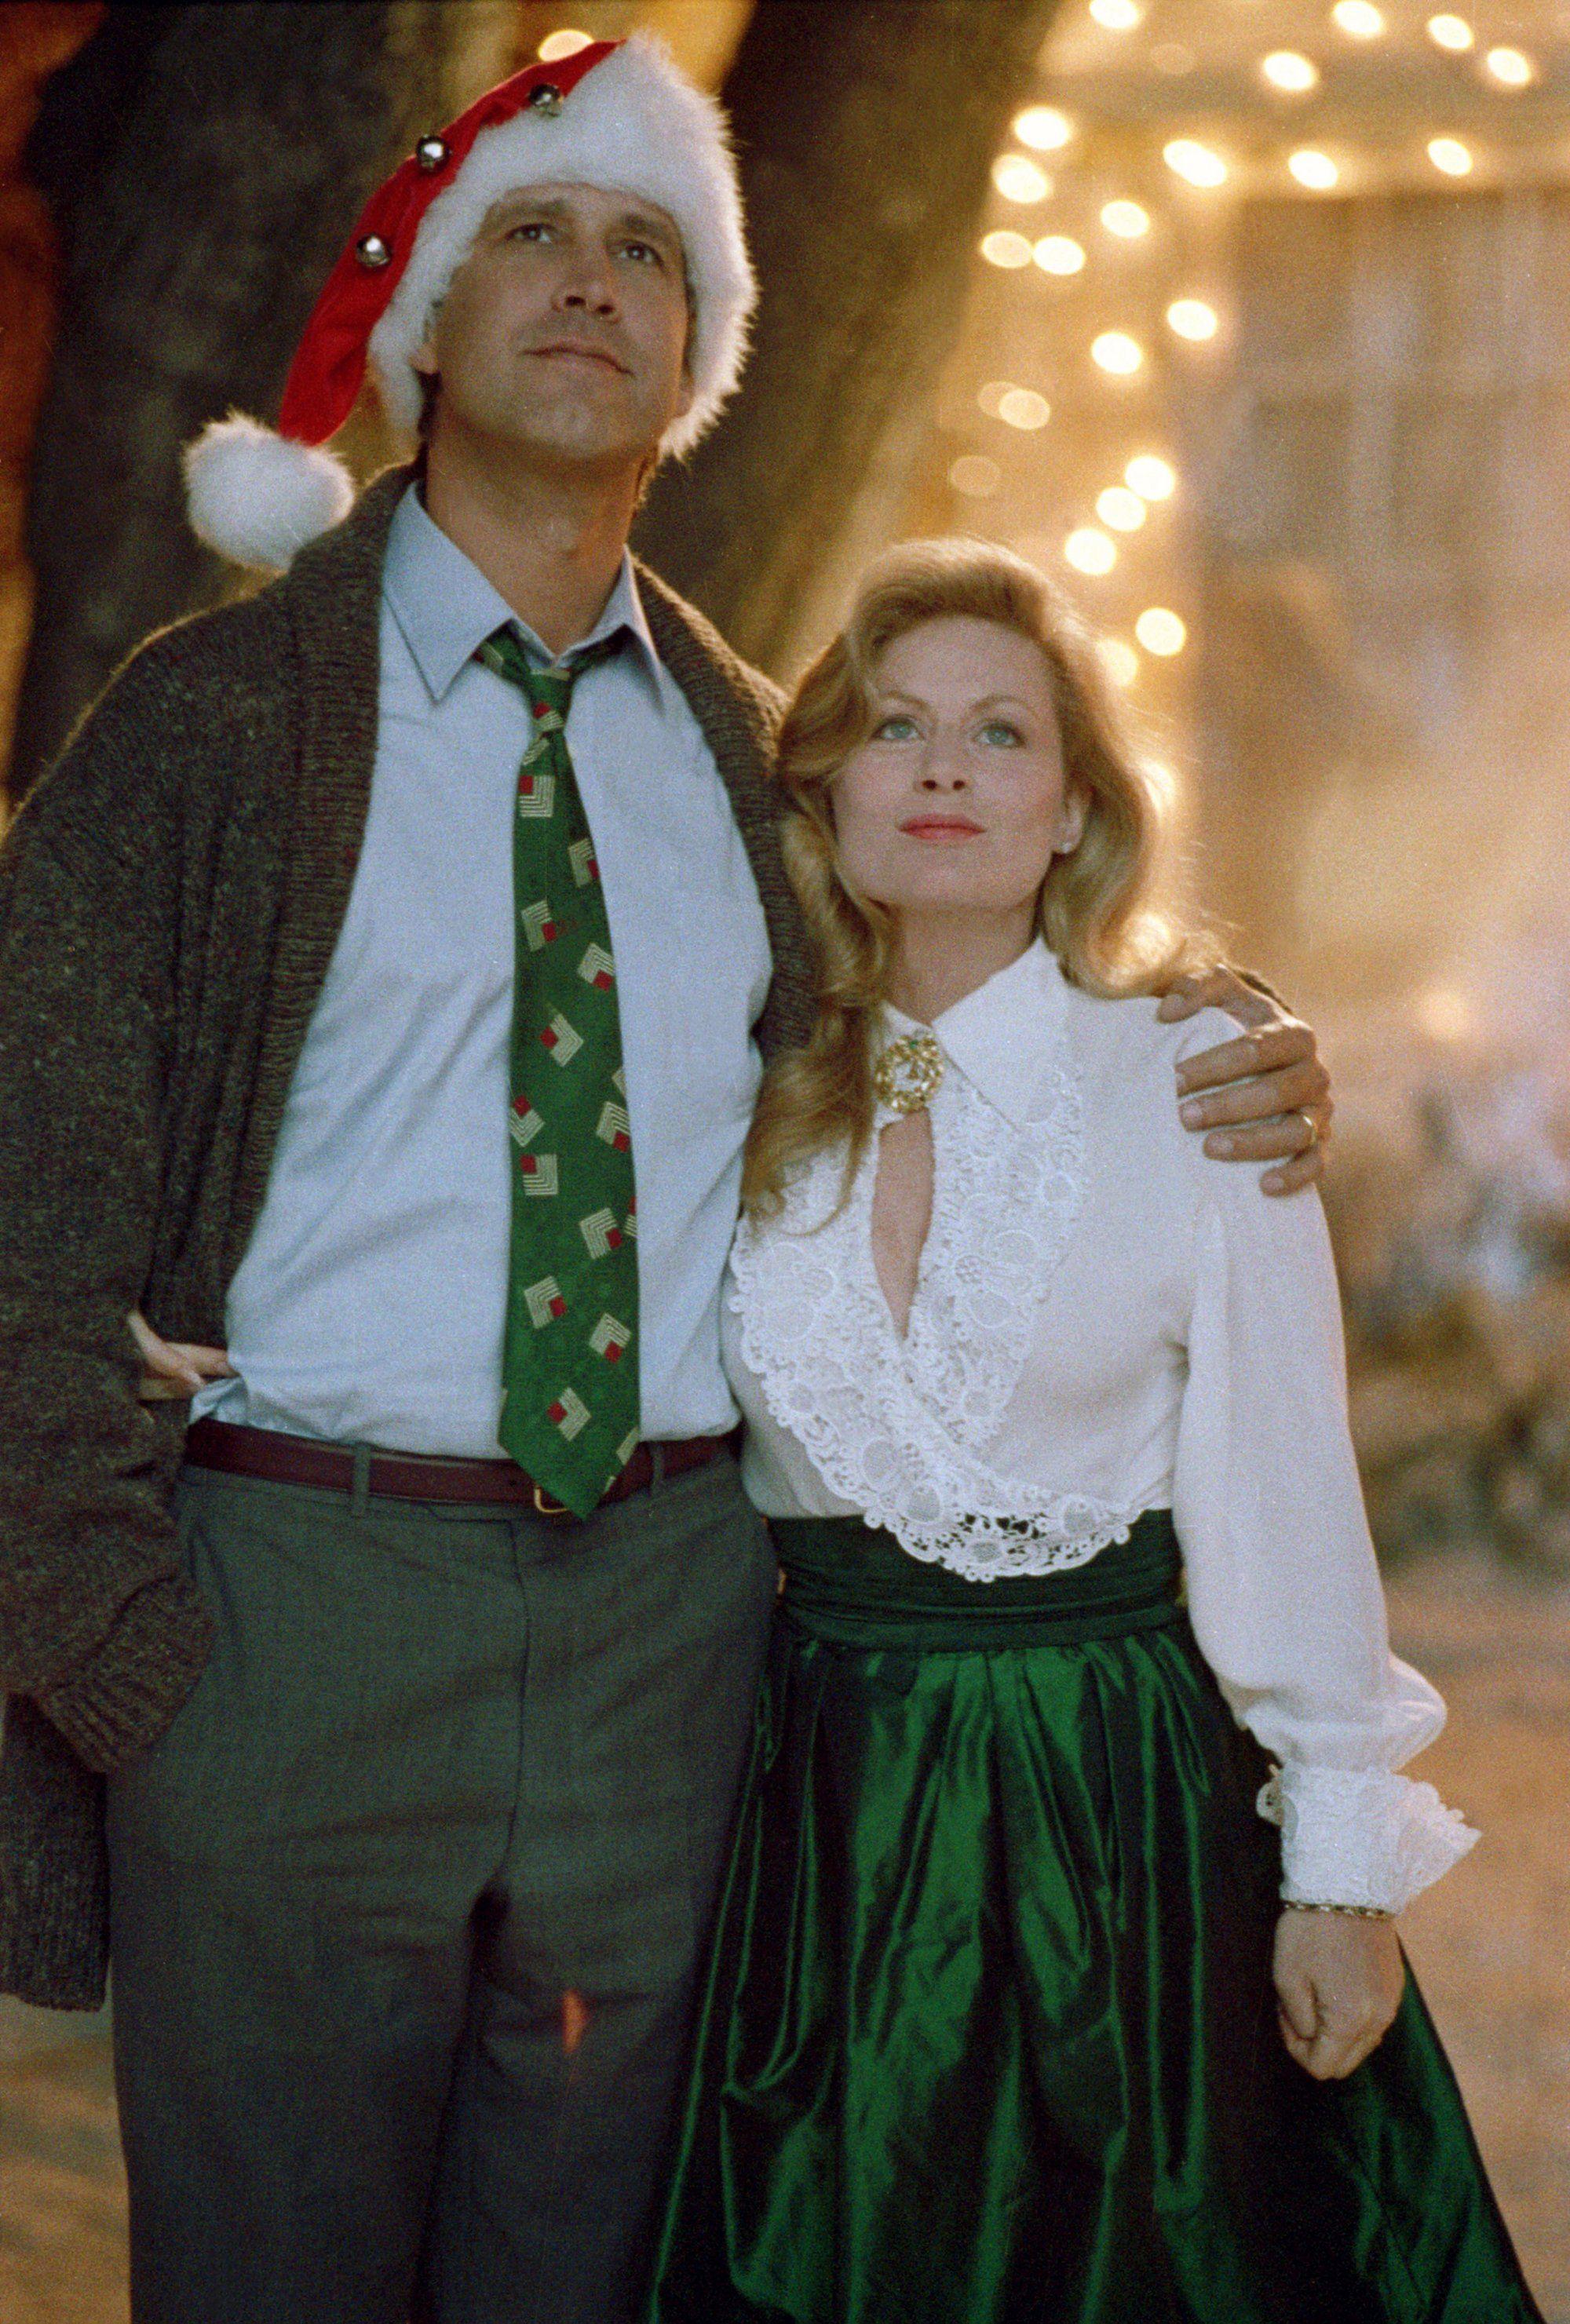 National Lampoon S Christmas Vacation Funny Christmas Costumes Christmas Vacation Costumes Classic Christmas Movies